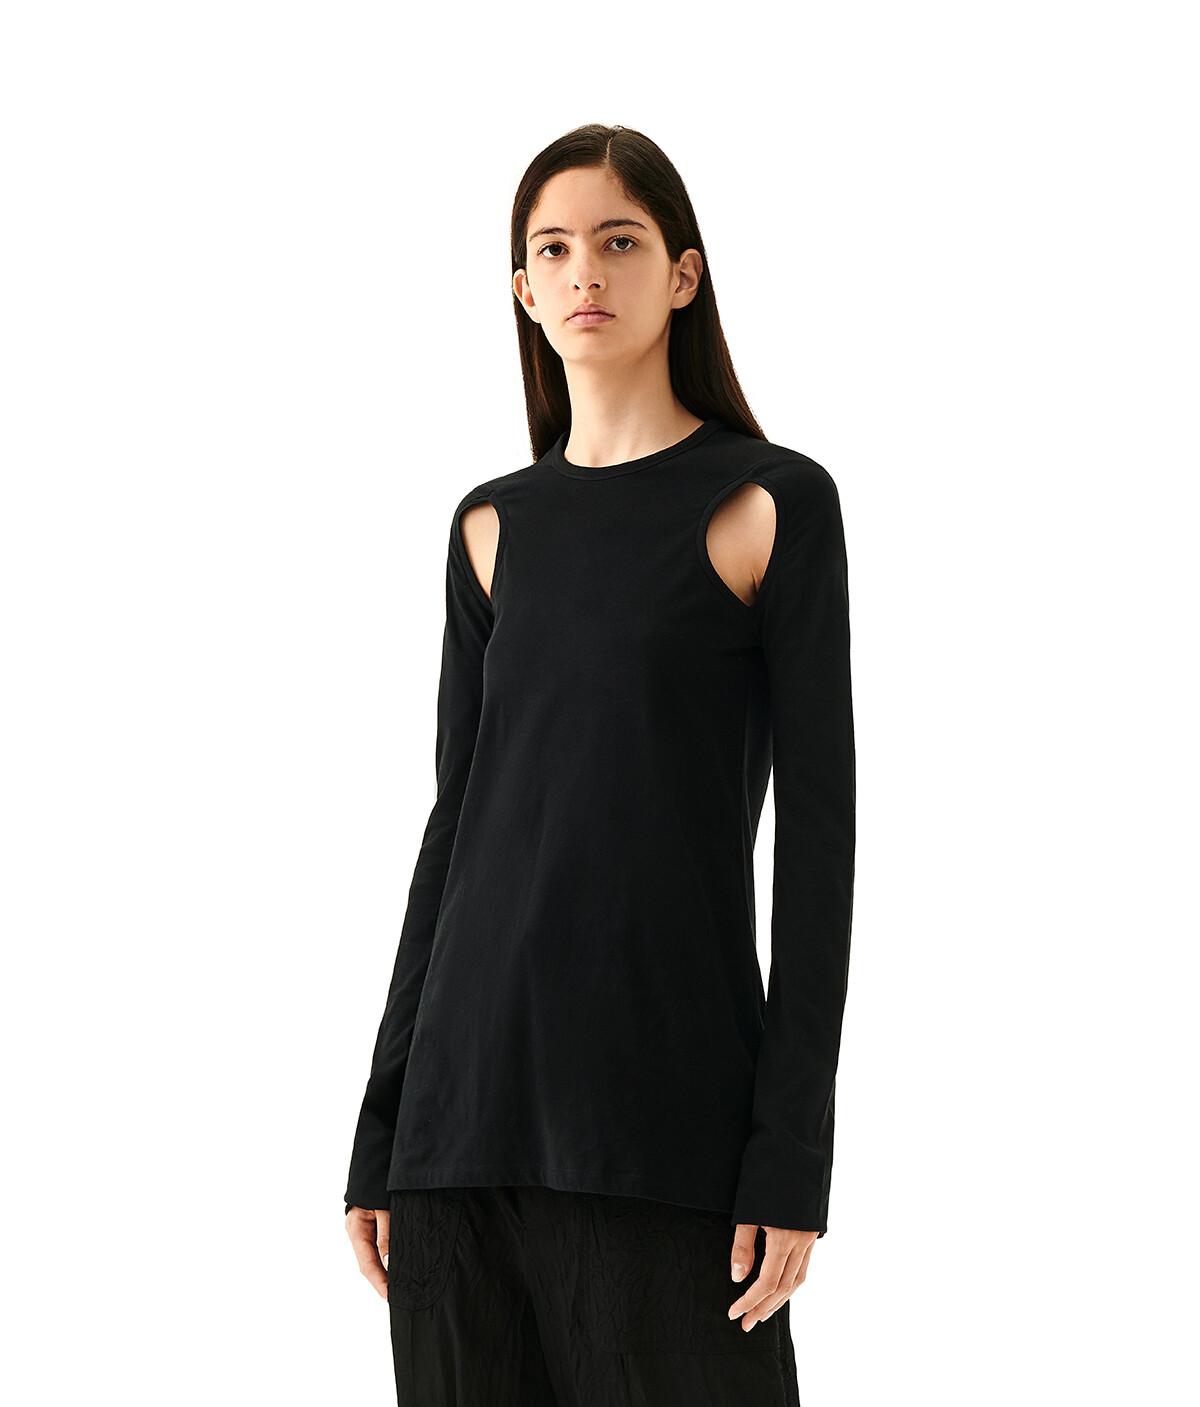 LOEWE Cut Out Long Slv T-Shirt Black front